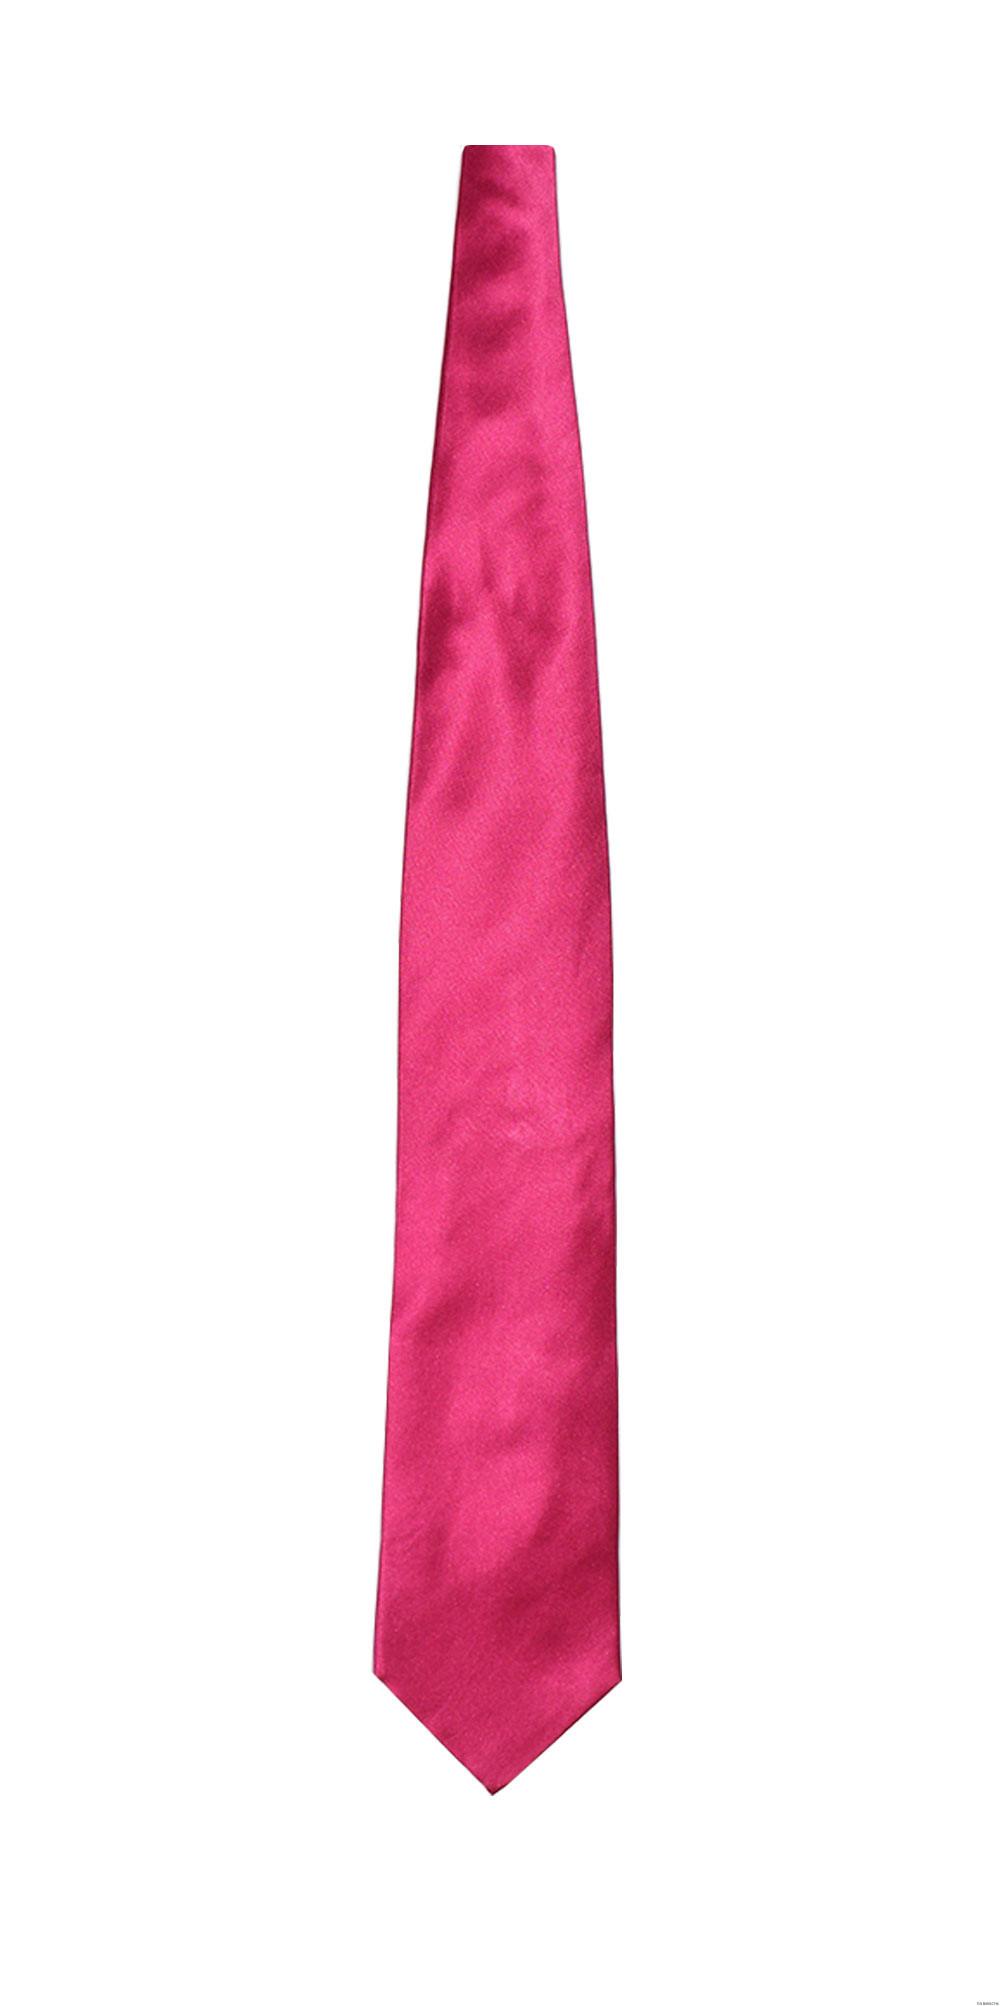 men's hot pink long dress tie at Tuxbling.com